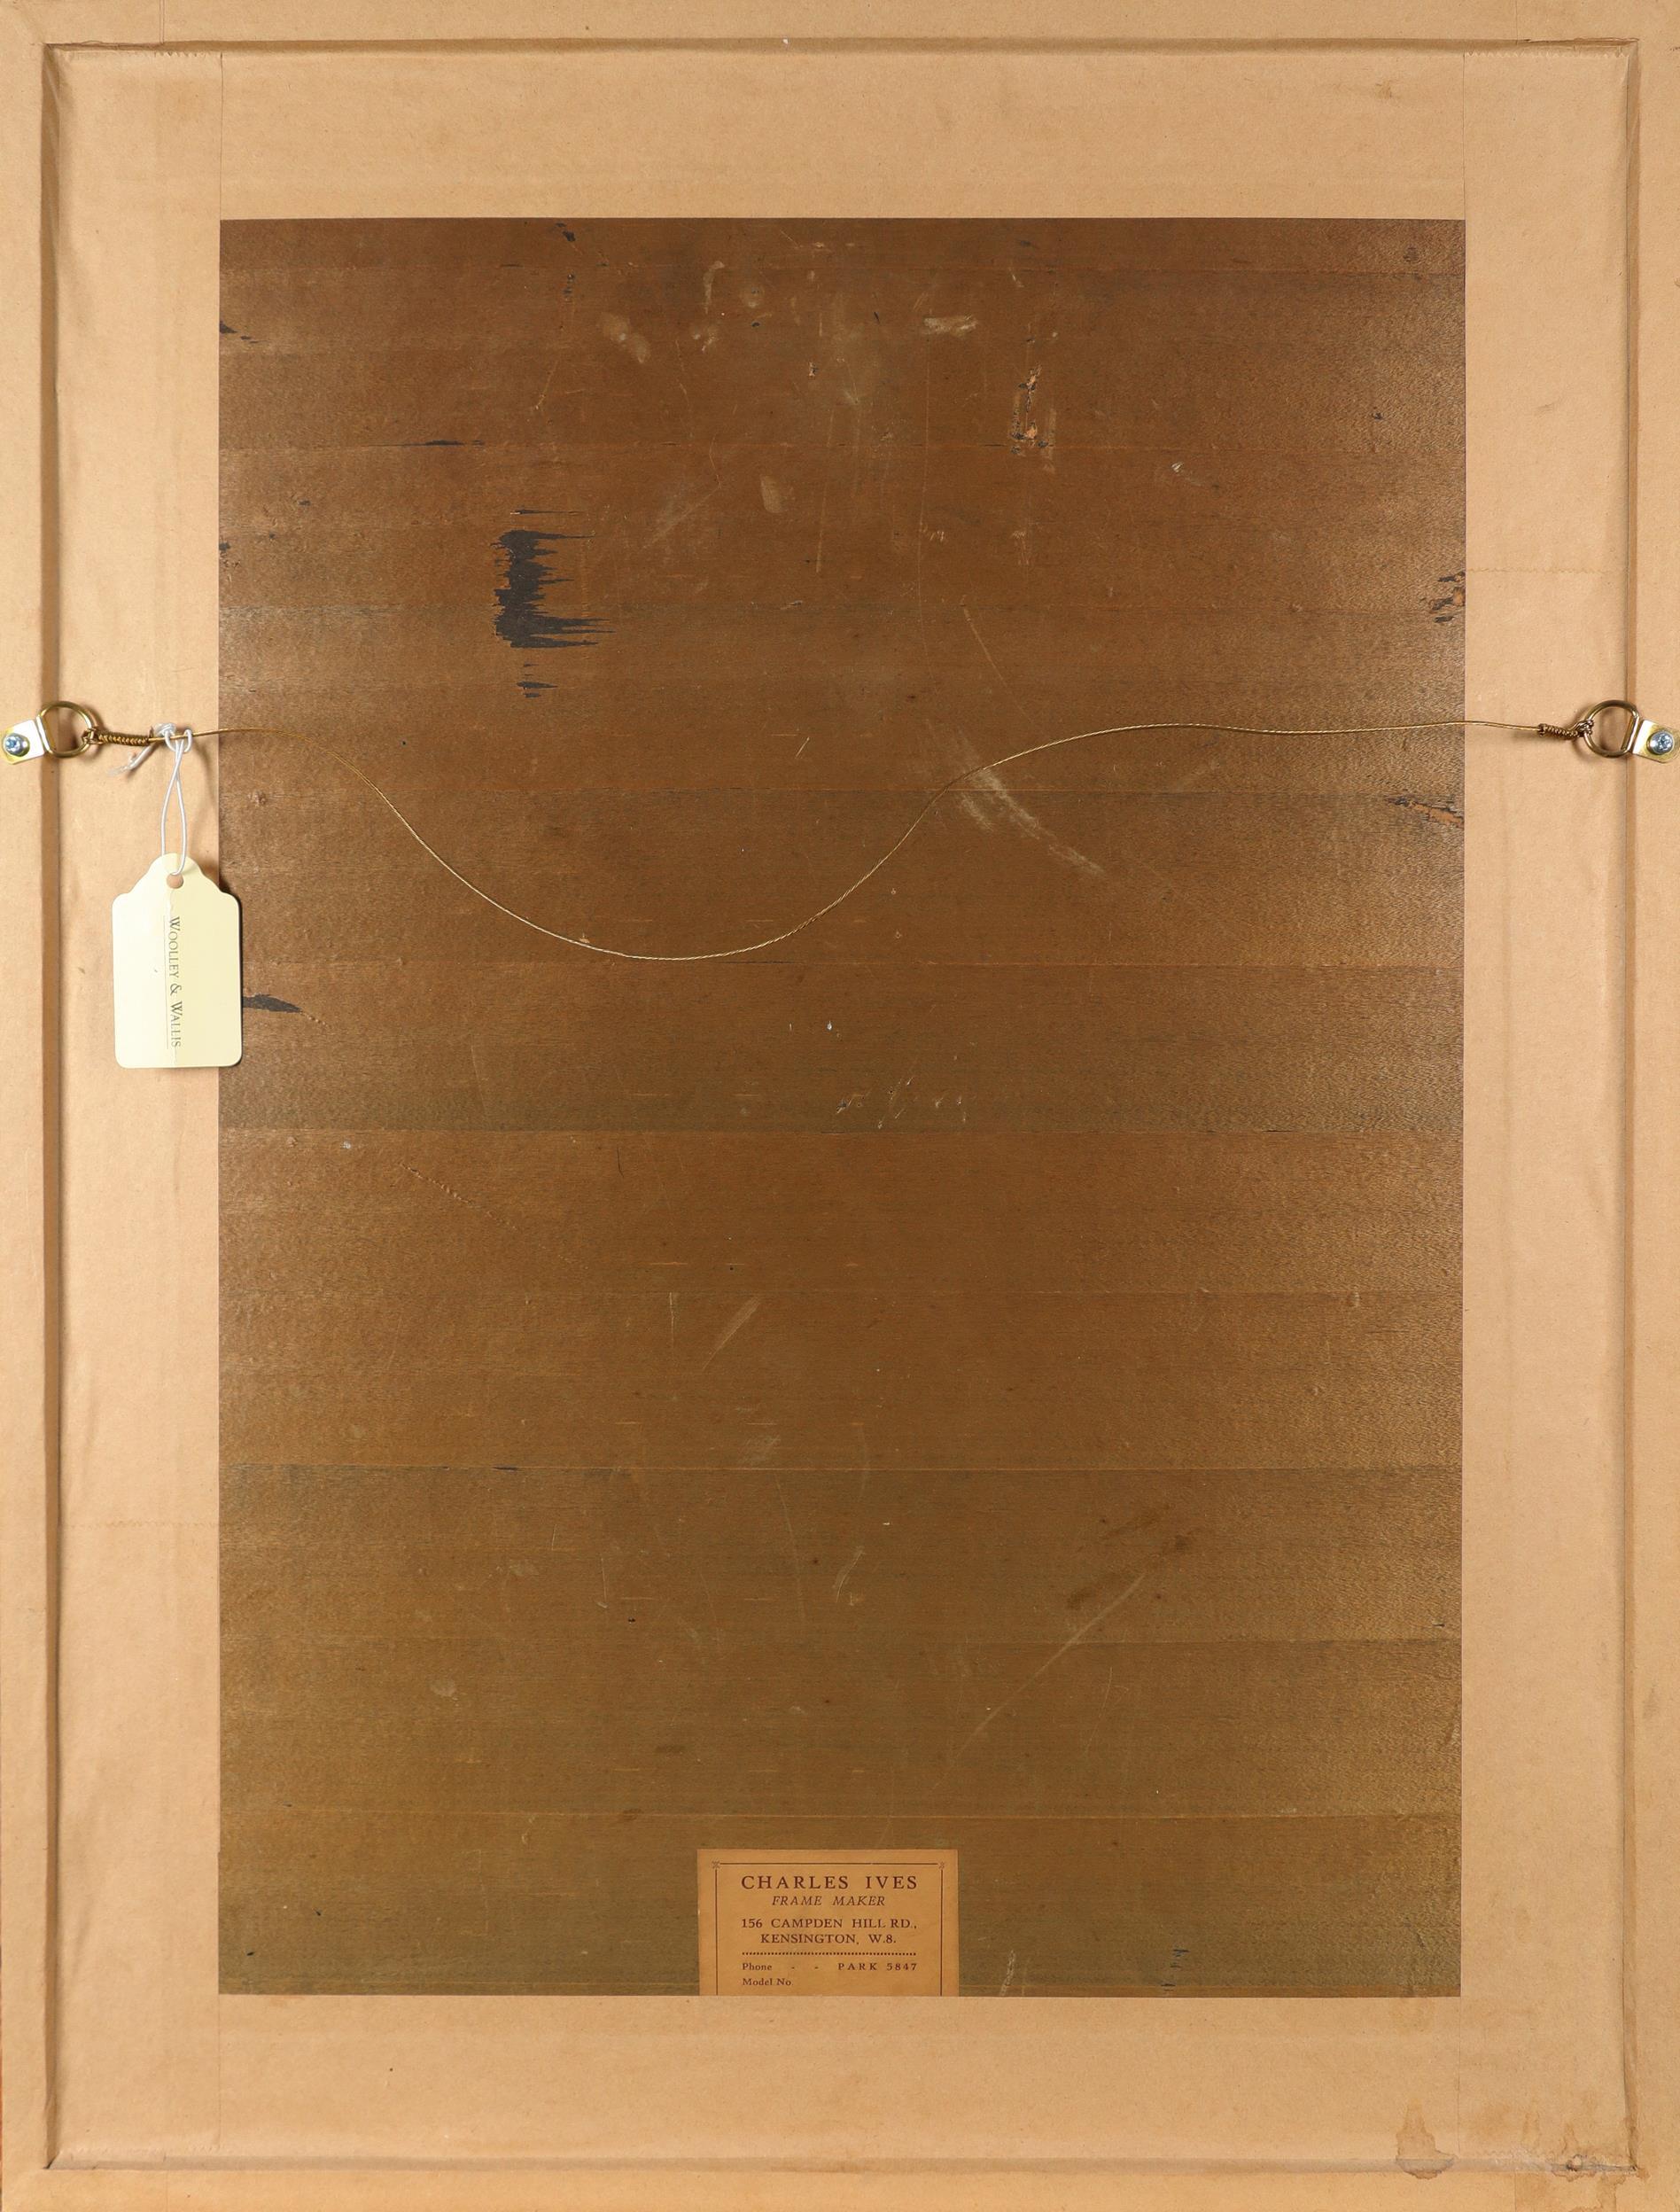 ‡Herbert James Gunn (1893-1964) Portrait of a woman Signed James Gunn (lower right) Red chalk - Image 3 of 3